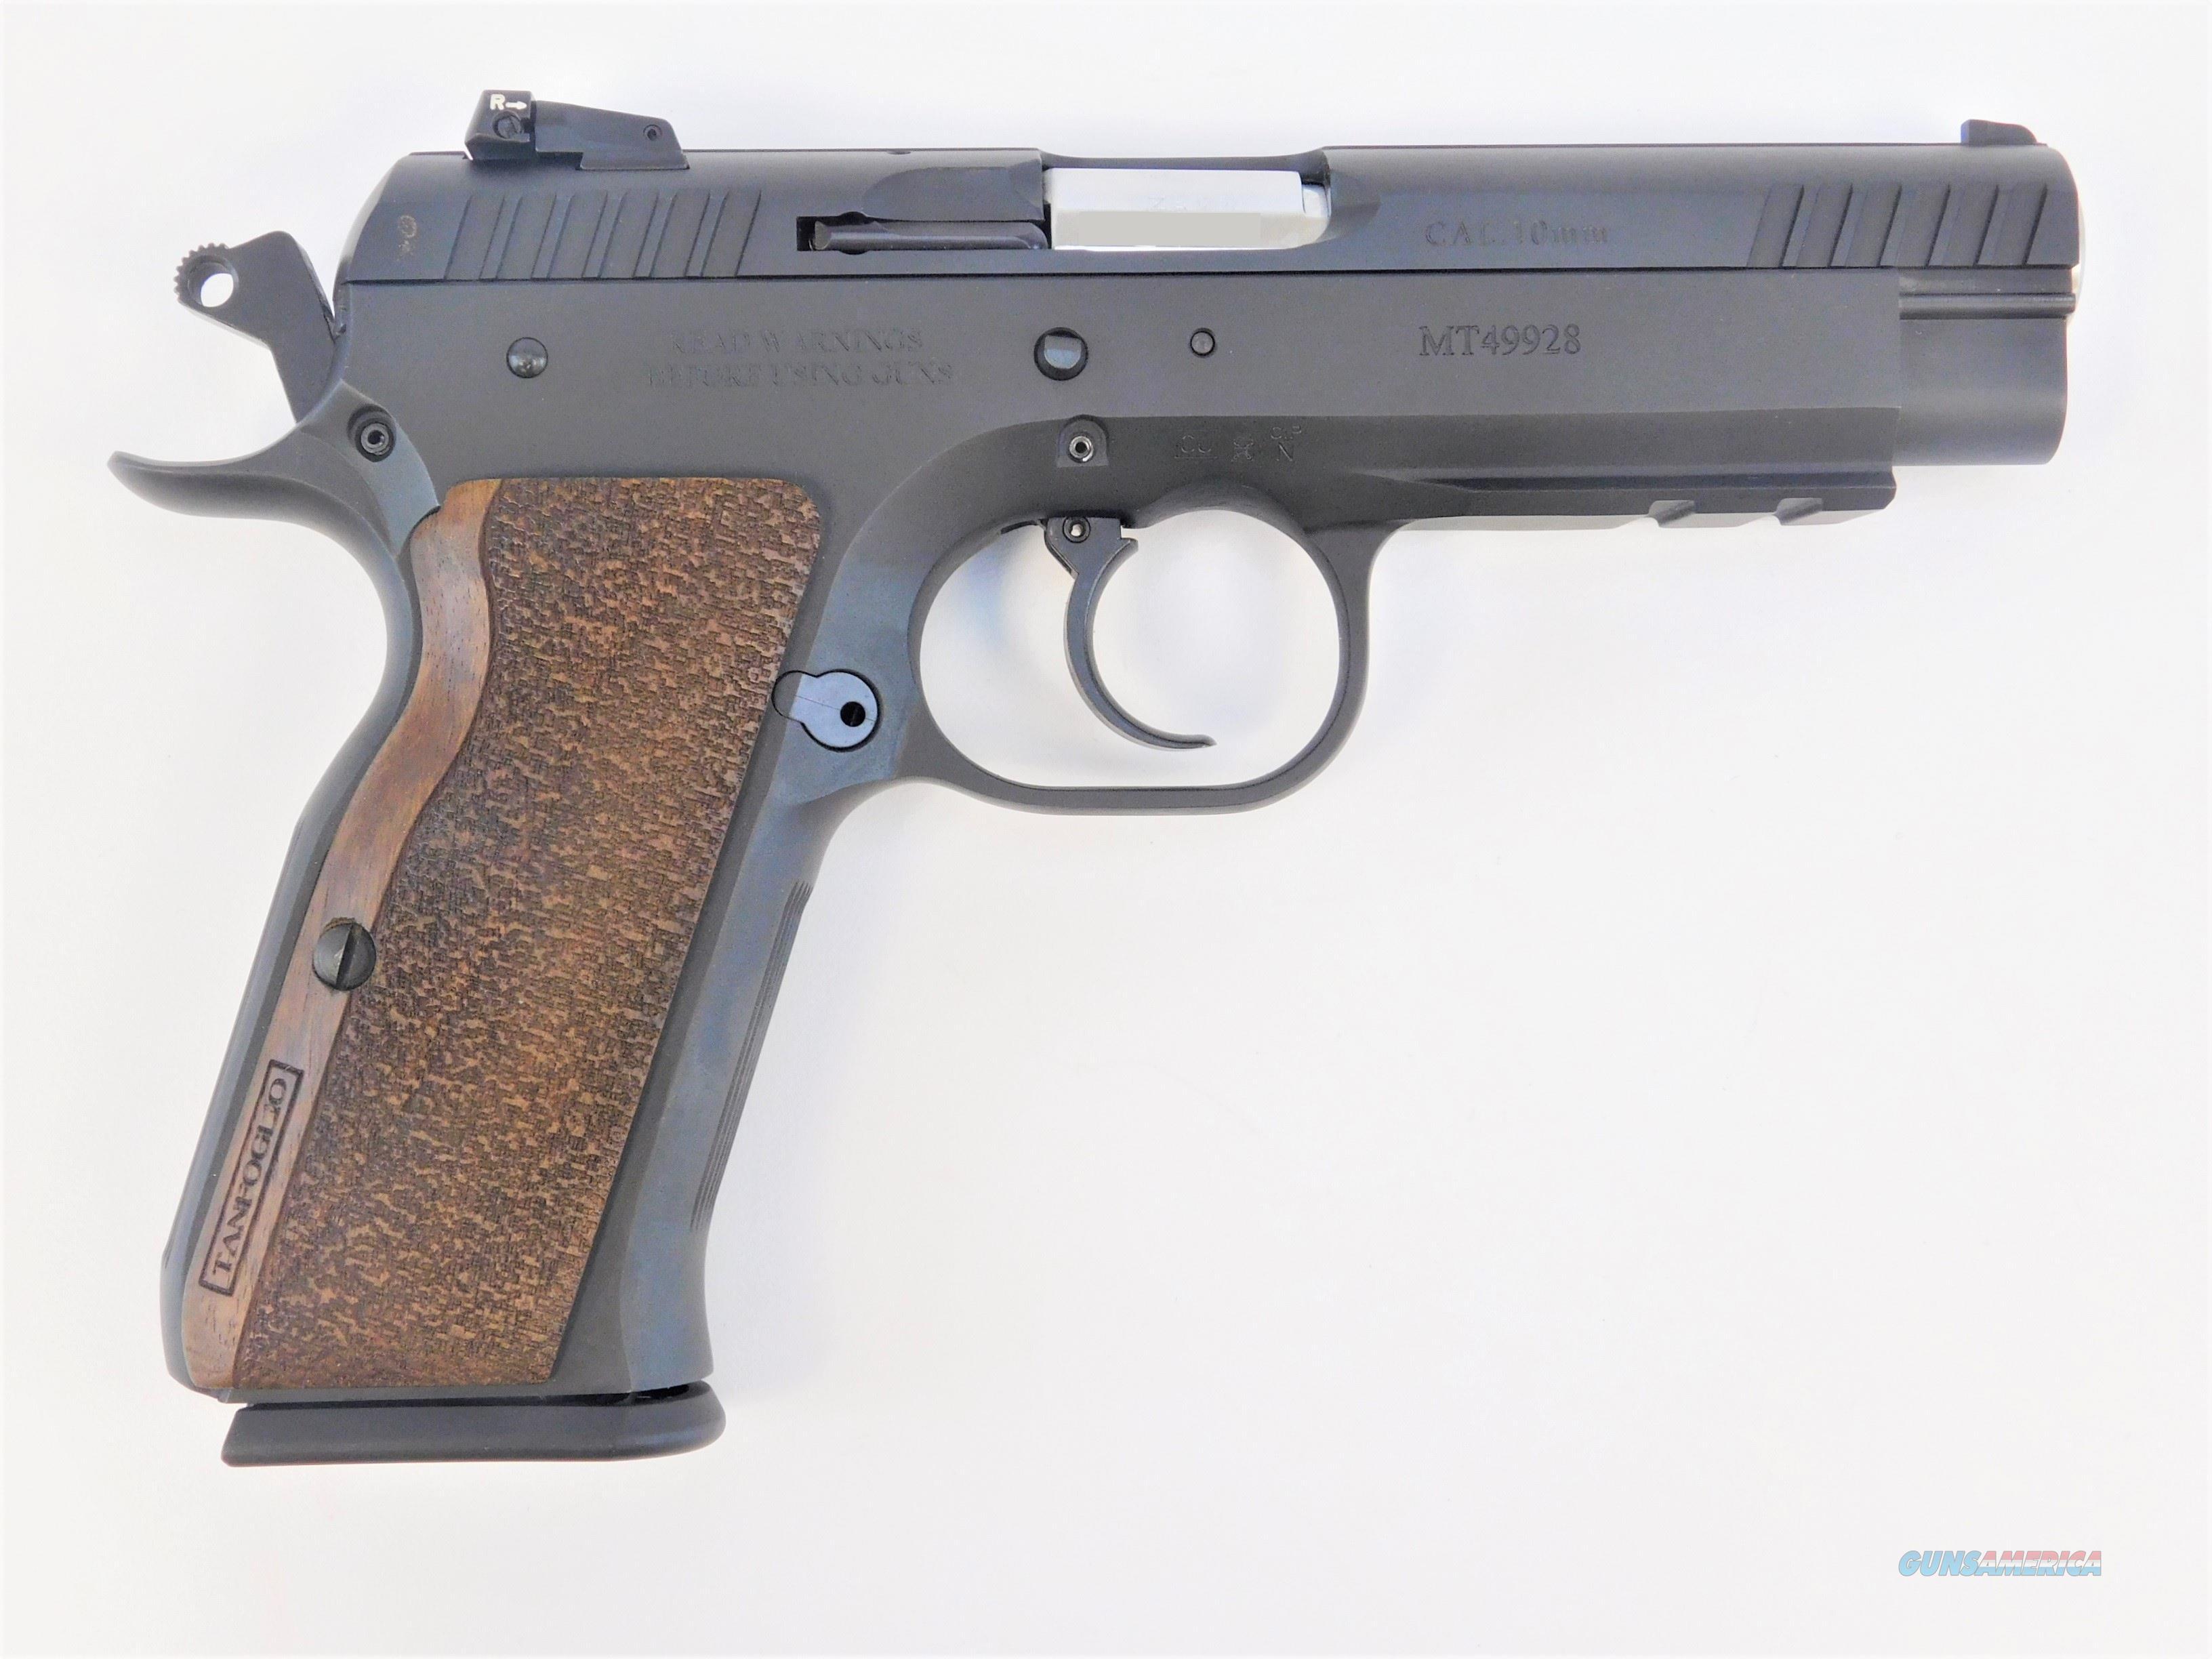 "EAA Corp. Witness Pro .45 ACP 4.5"" Bull 10 Rds 600054   Guns > Pistols > EAA Pistols > Other"